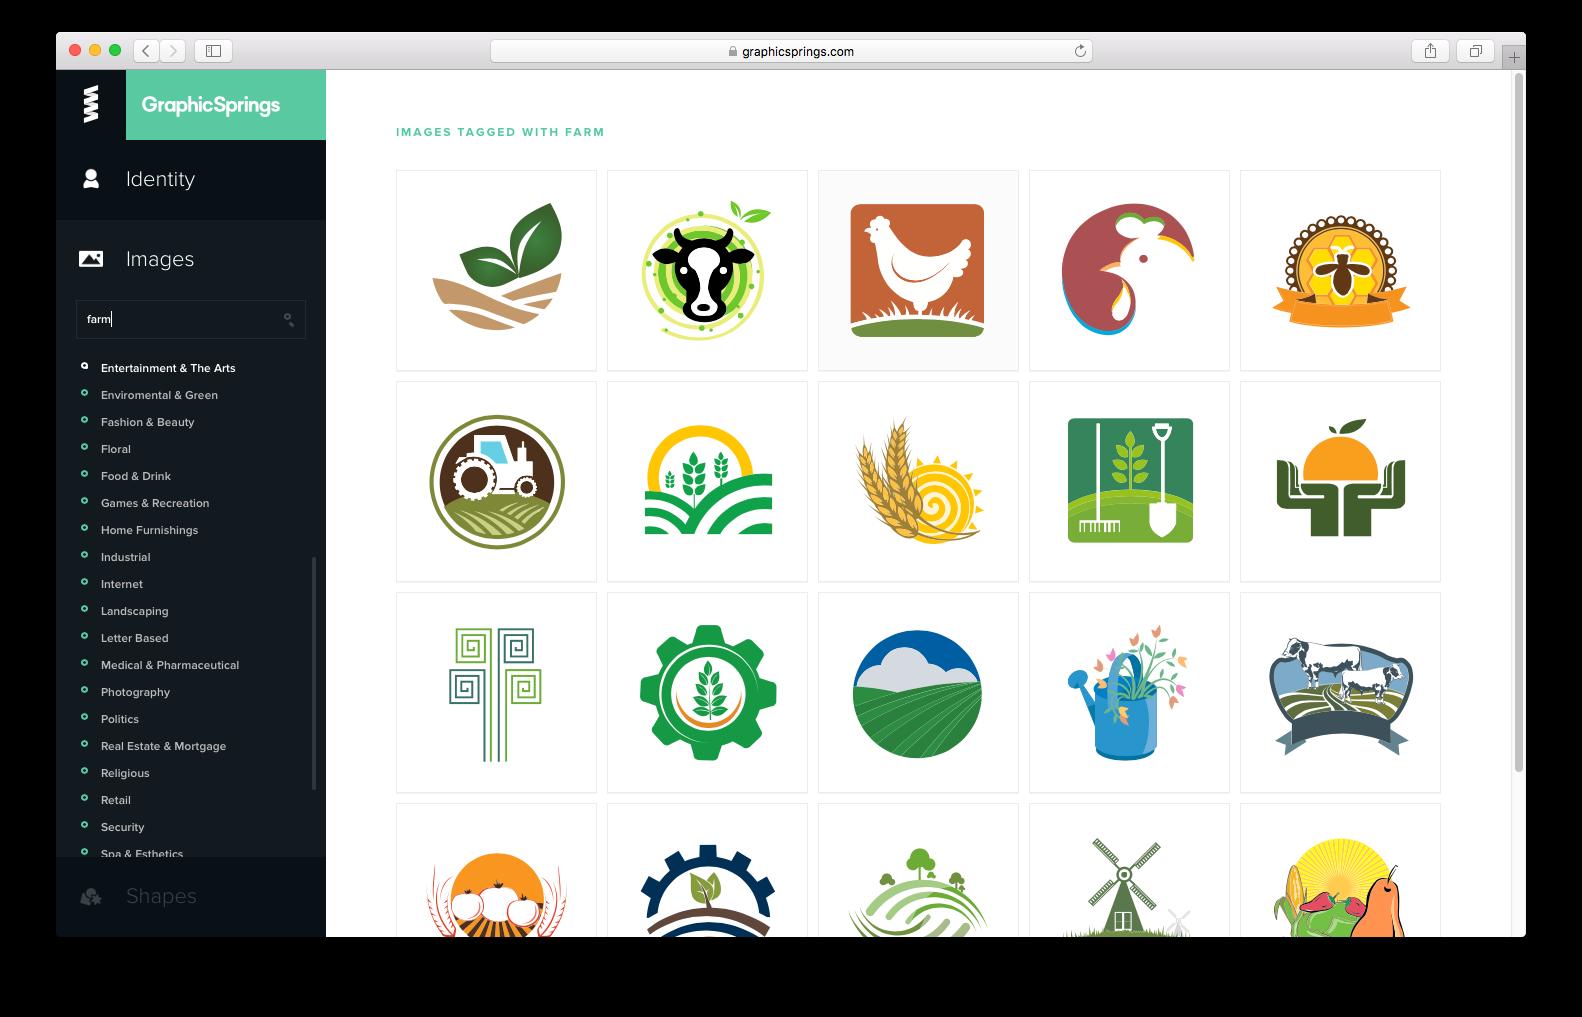 GraphicSprings free logo maker